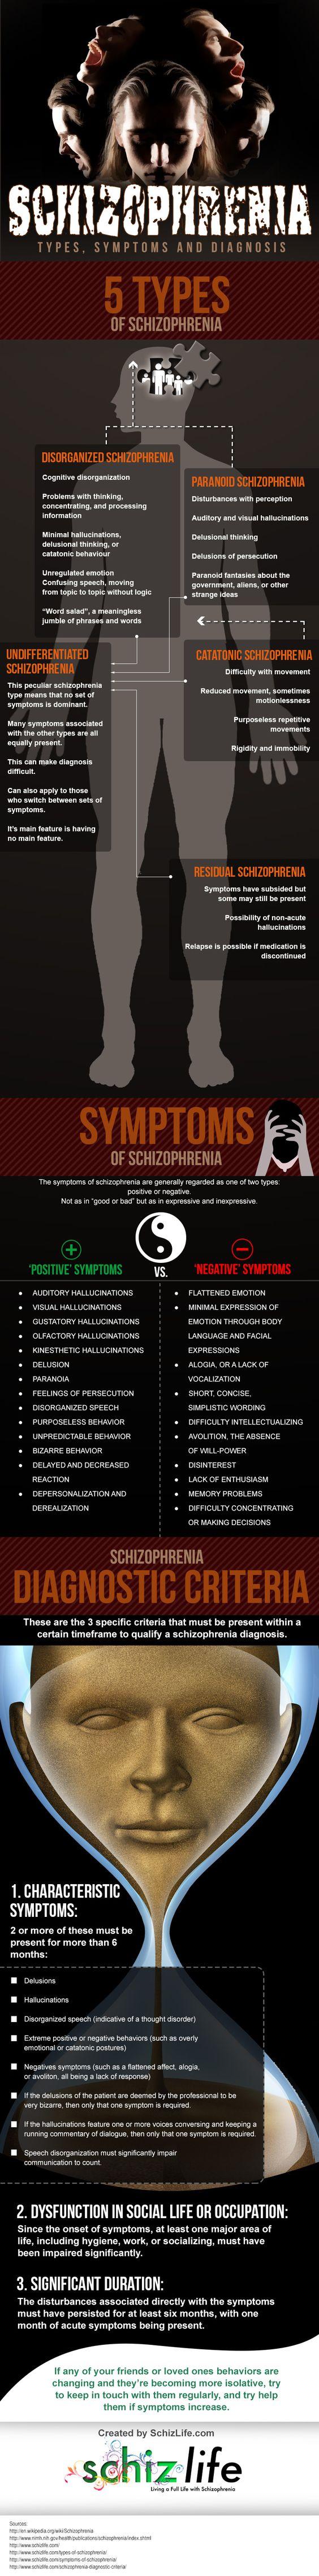 Schizophrenia Infographic on the Types, Symptoms, and Diagnosis of Schizophrenia. http://www.schizlife.com/is-schizophrenia-genetic/